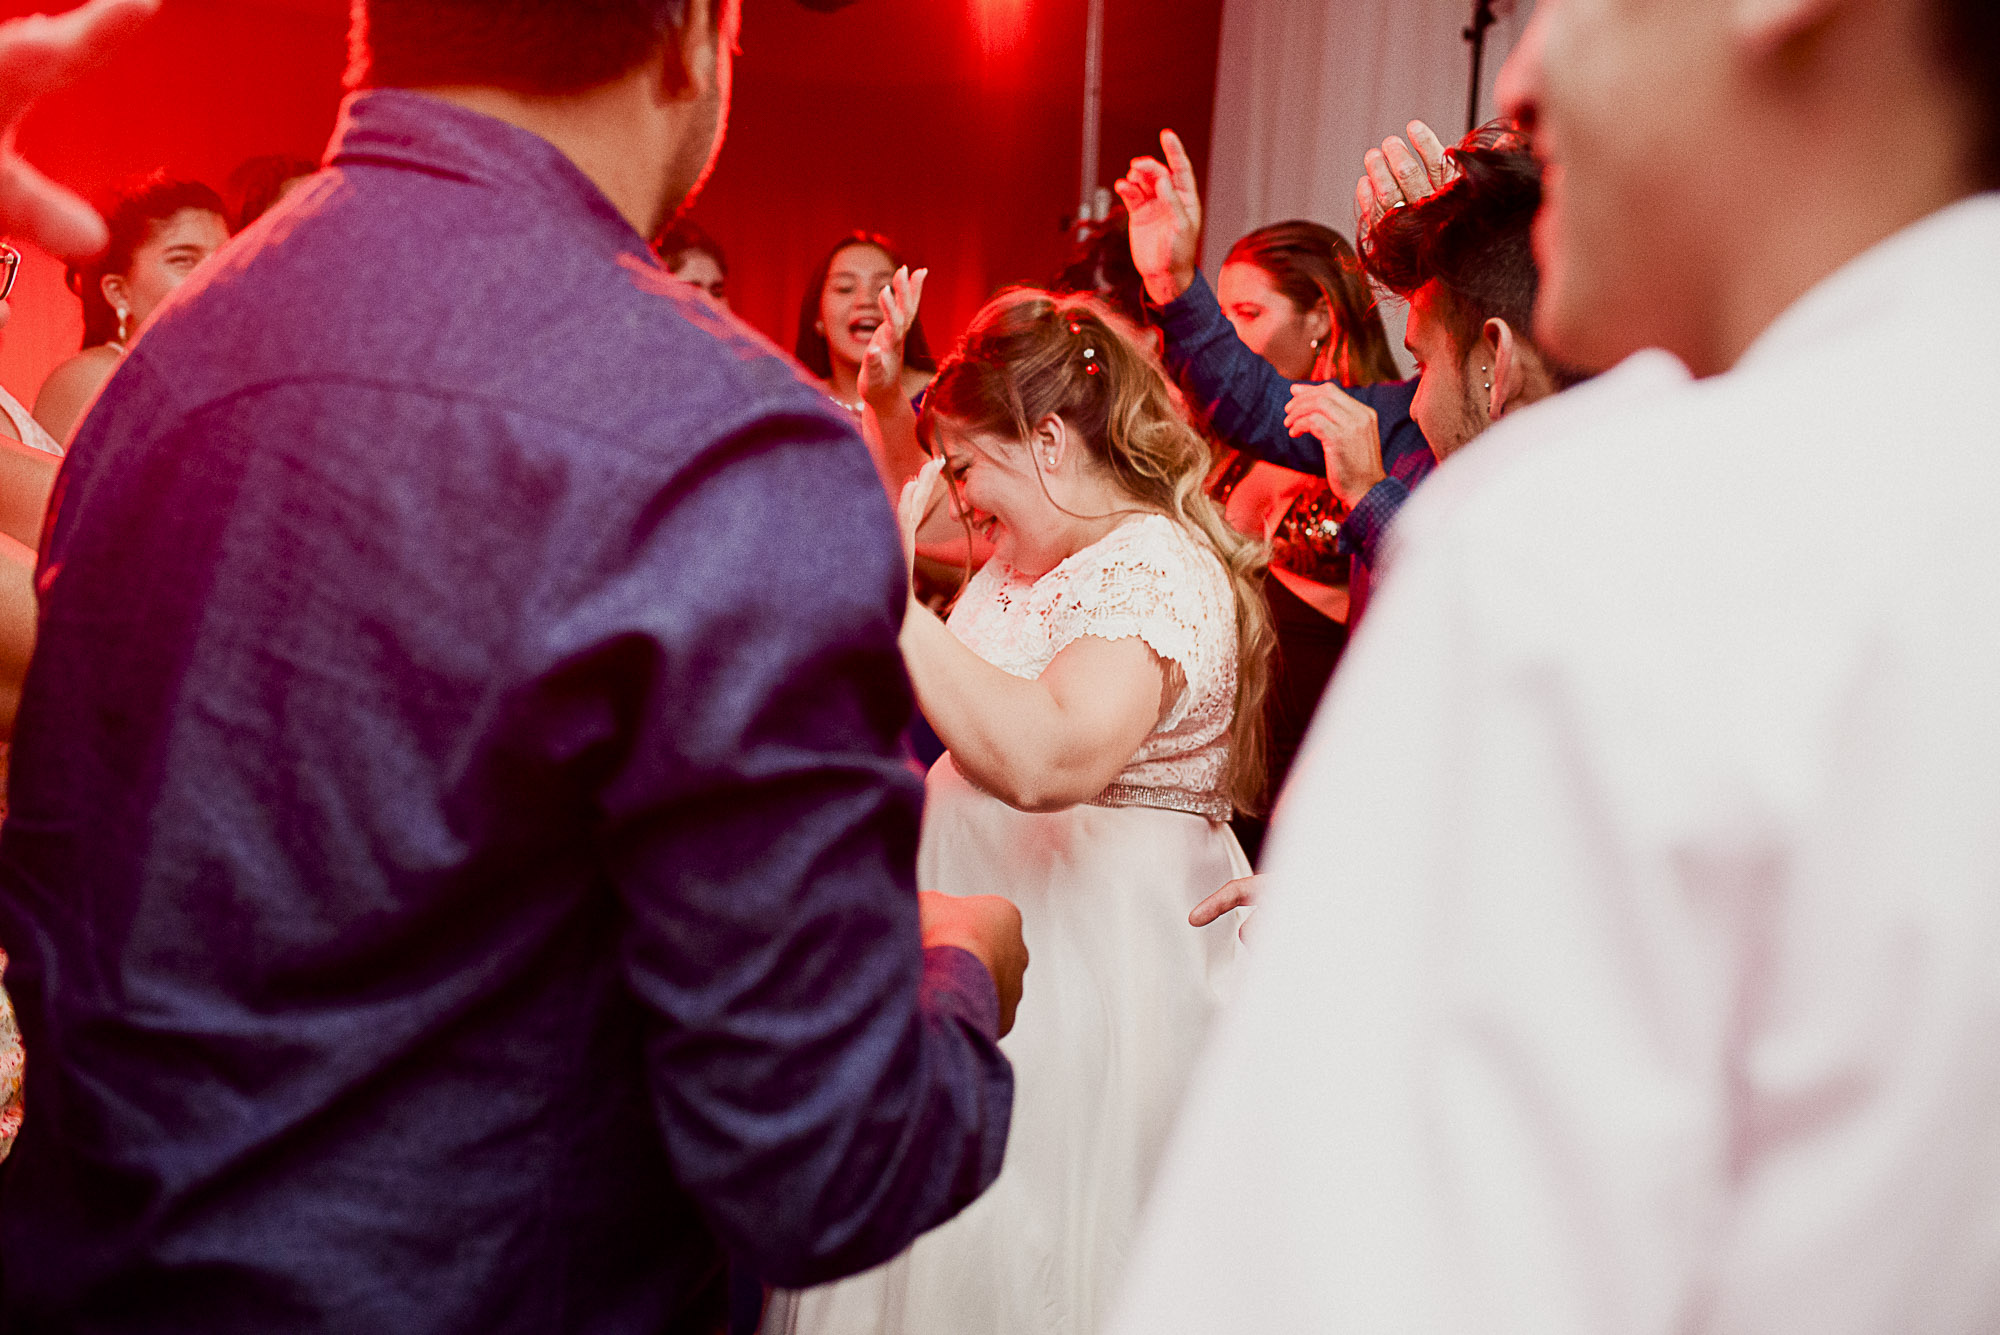 boda-vero-raul-patagonia-argentina-chilena-fotografo-de-bodas-argentina-casamiento-en-patagonia-gabriel-roa-photography-29